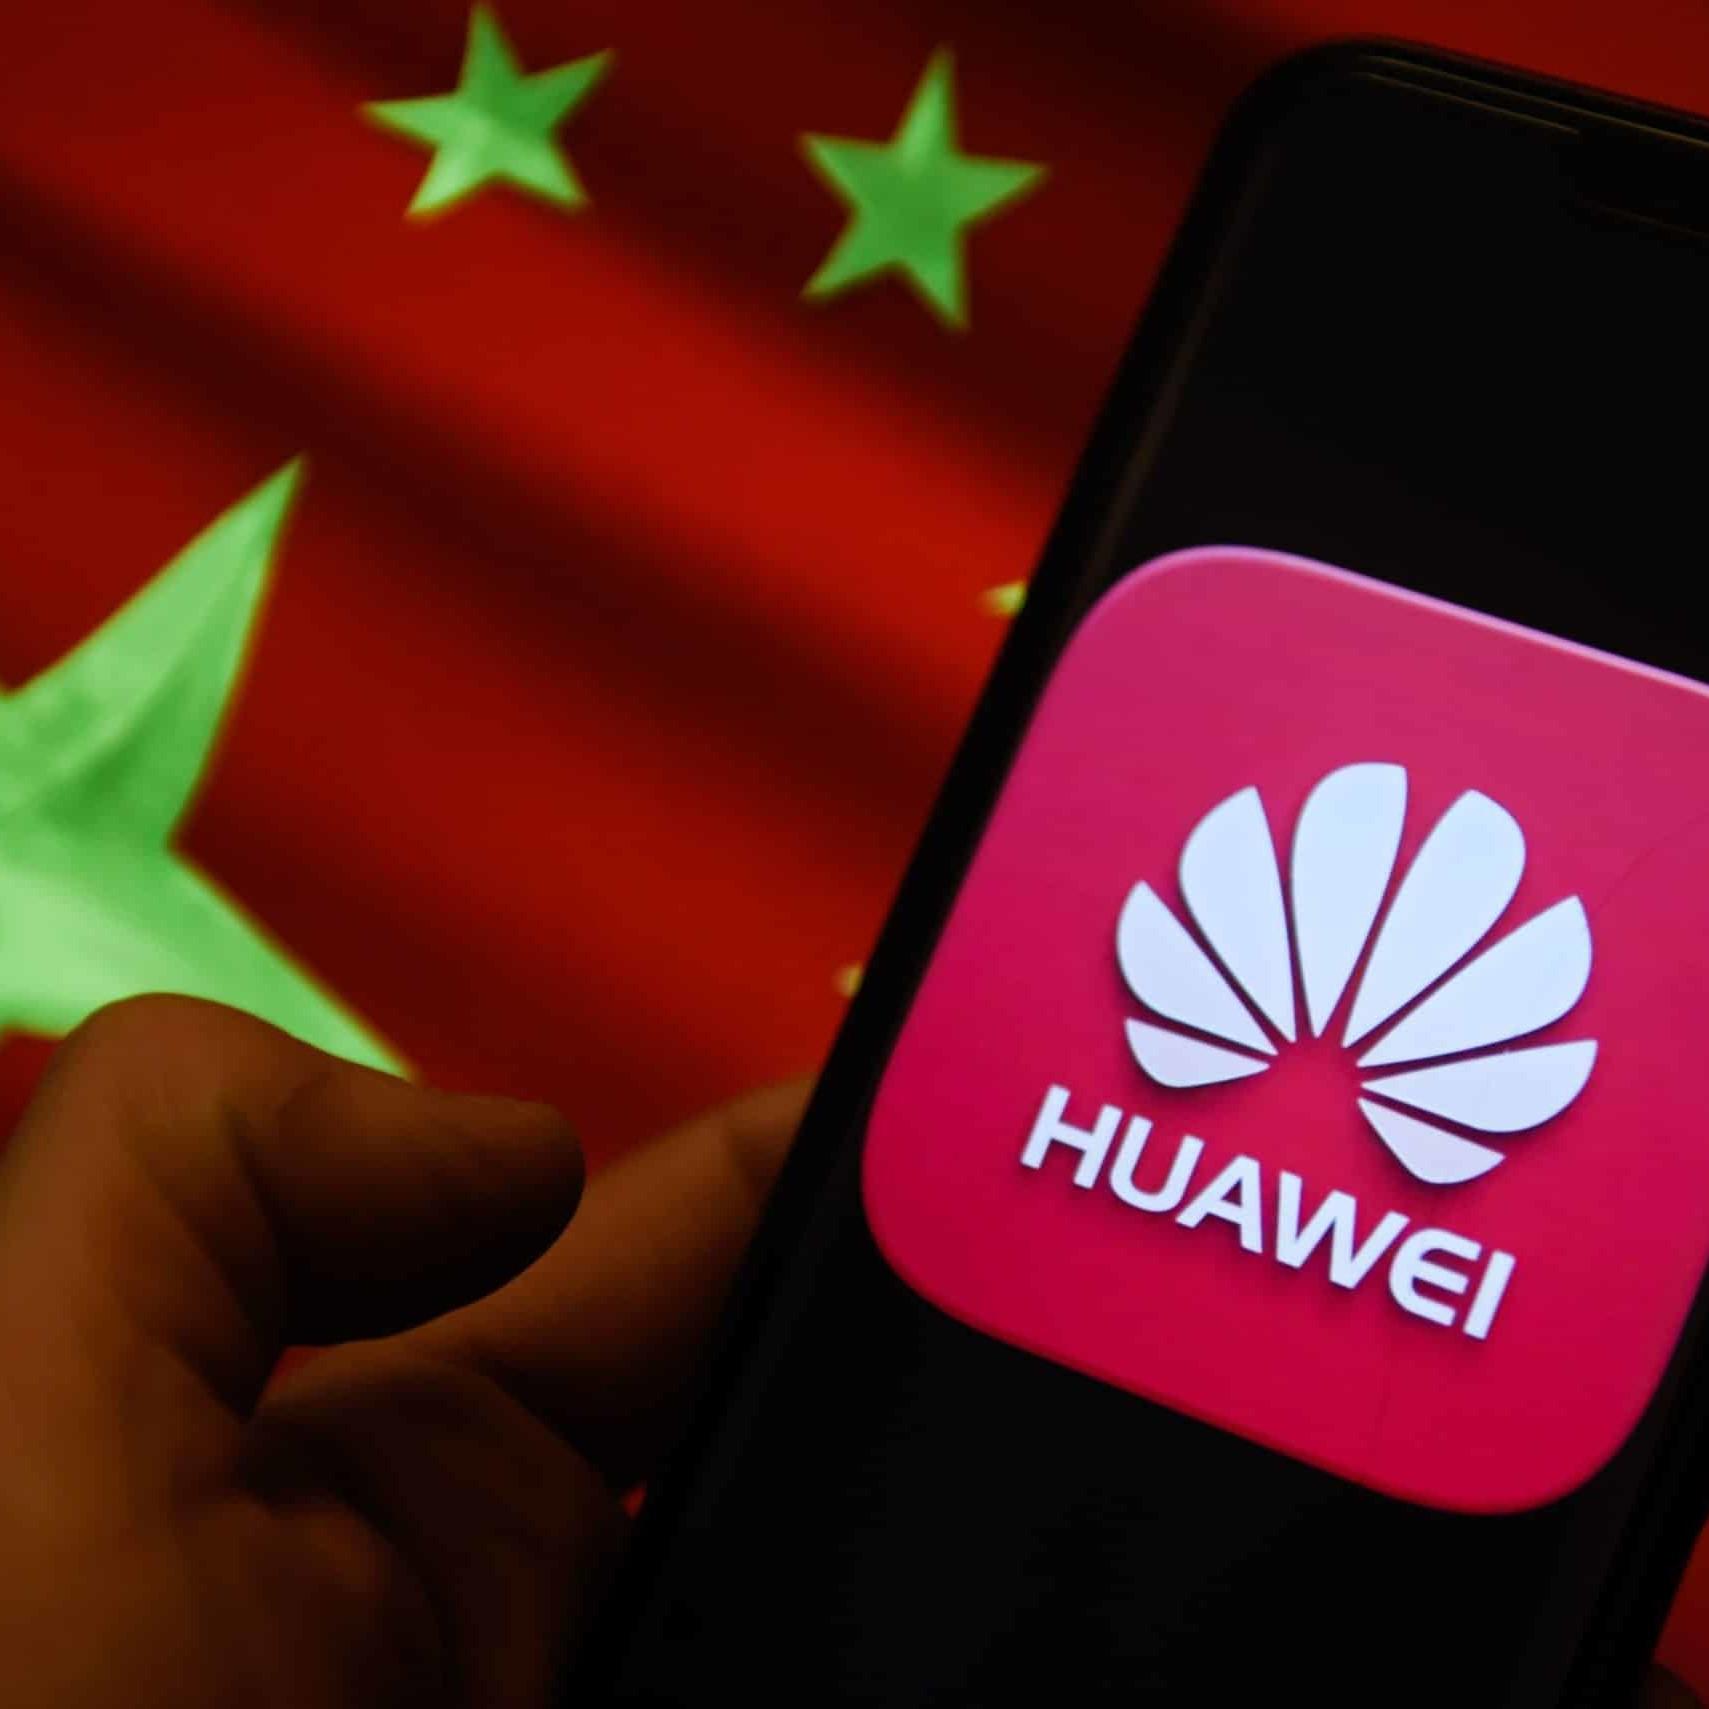 I legami tra Huawei e l'esercito cinese